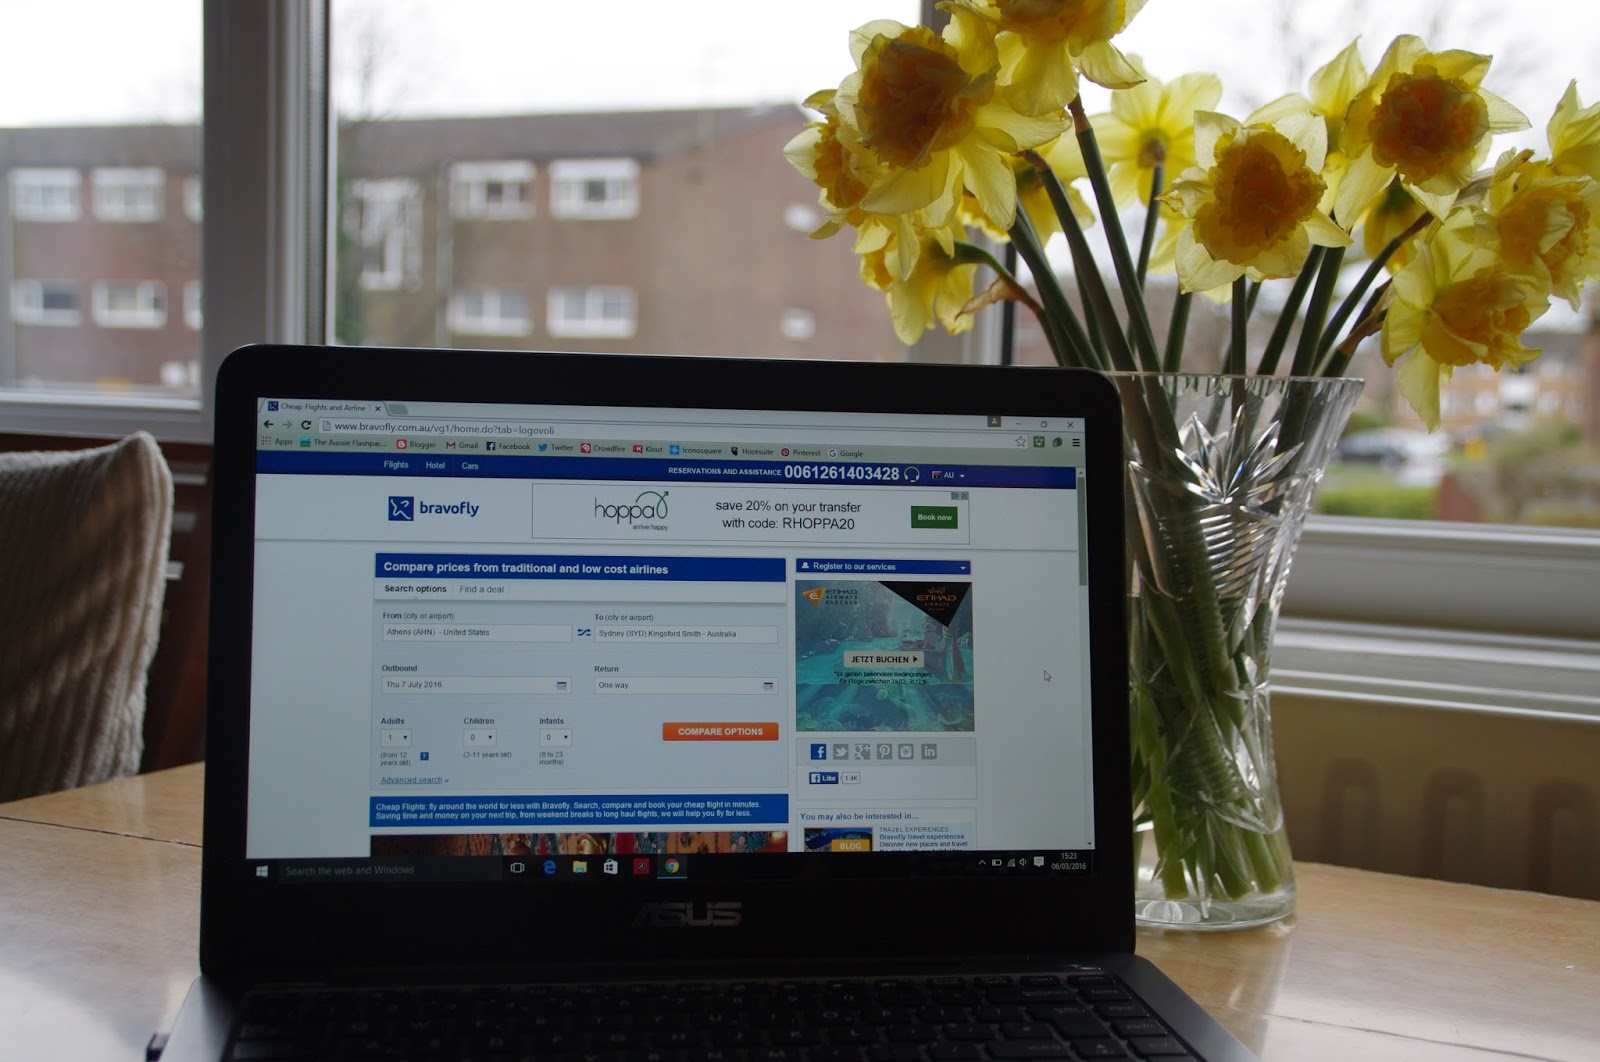 Bravofly Search Booking Engine